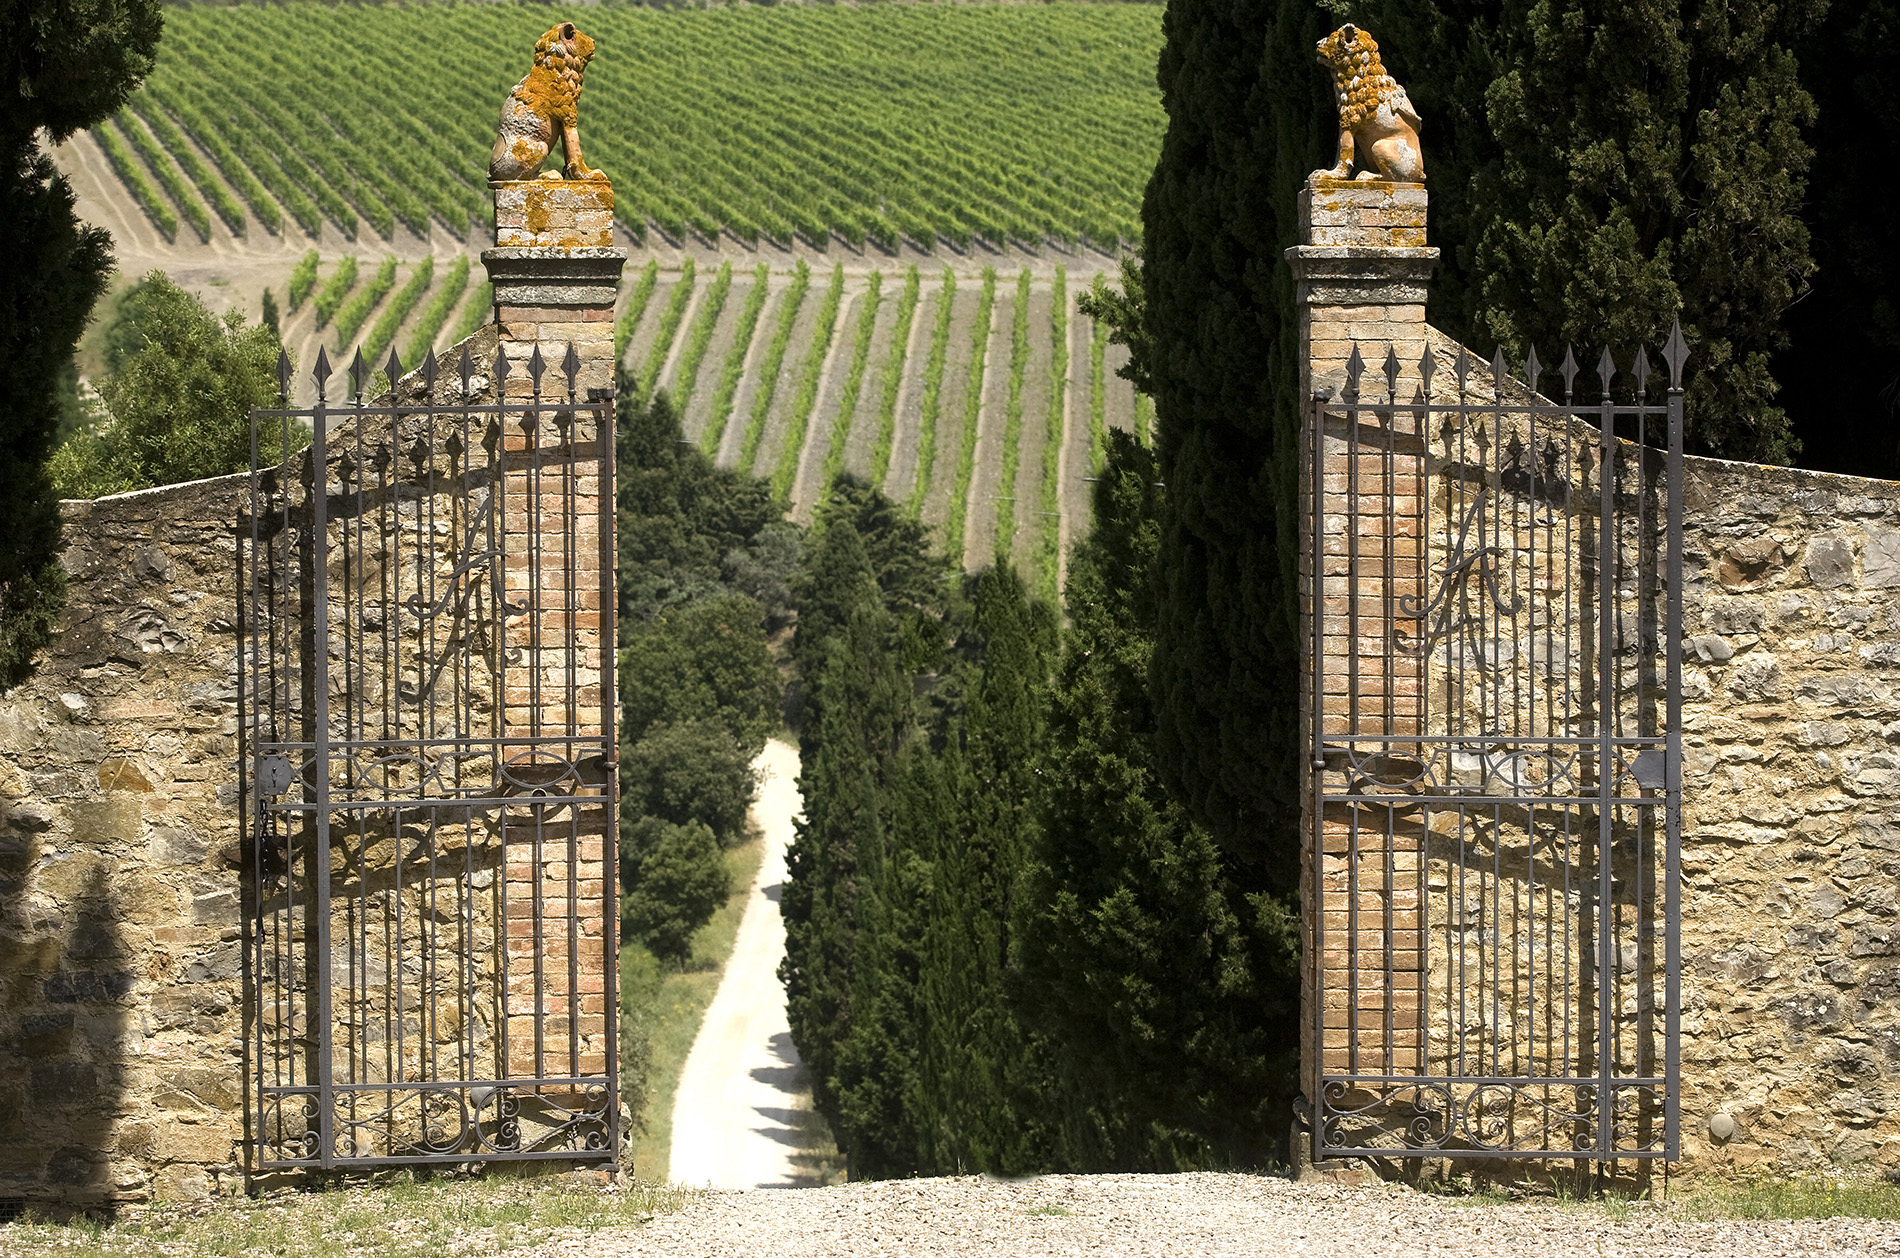 CastelGiocondo der Familie Frescobalidi in Montalcino